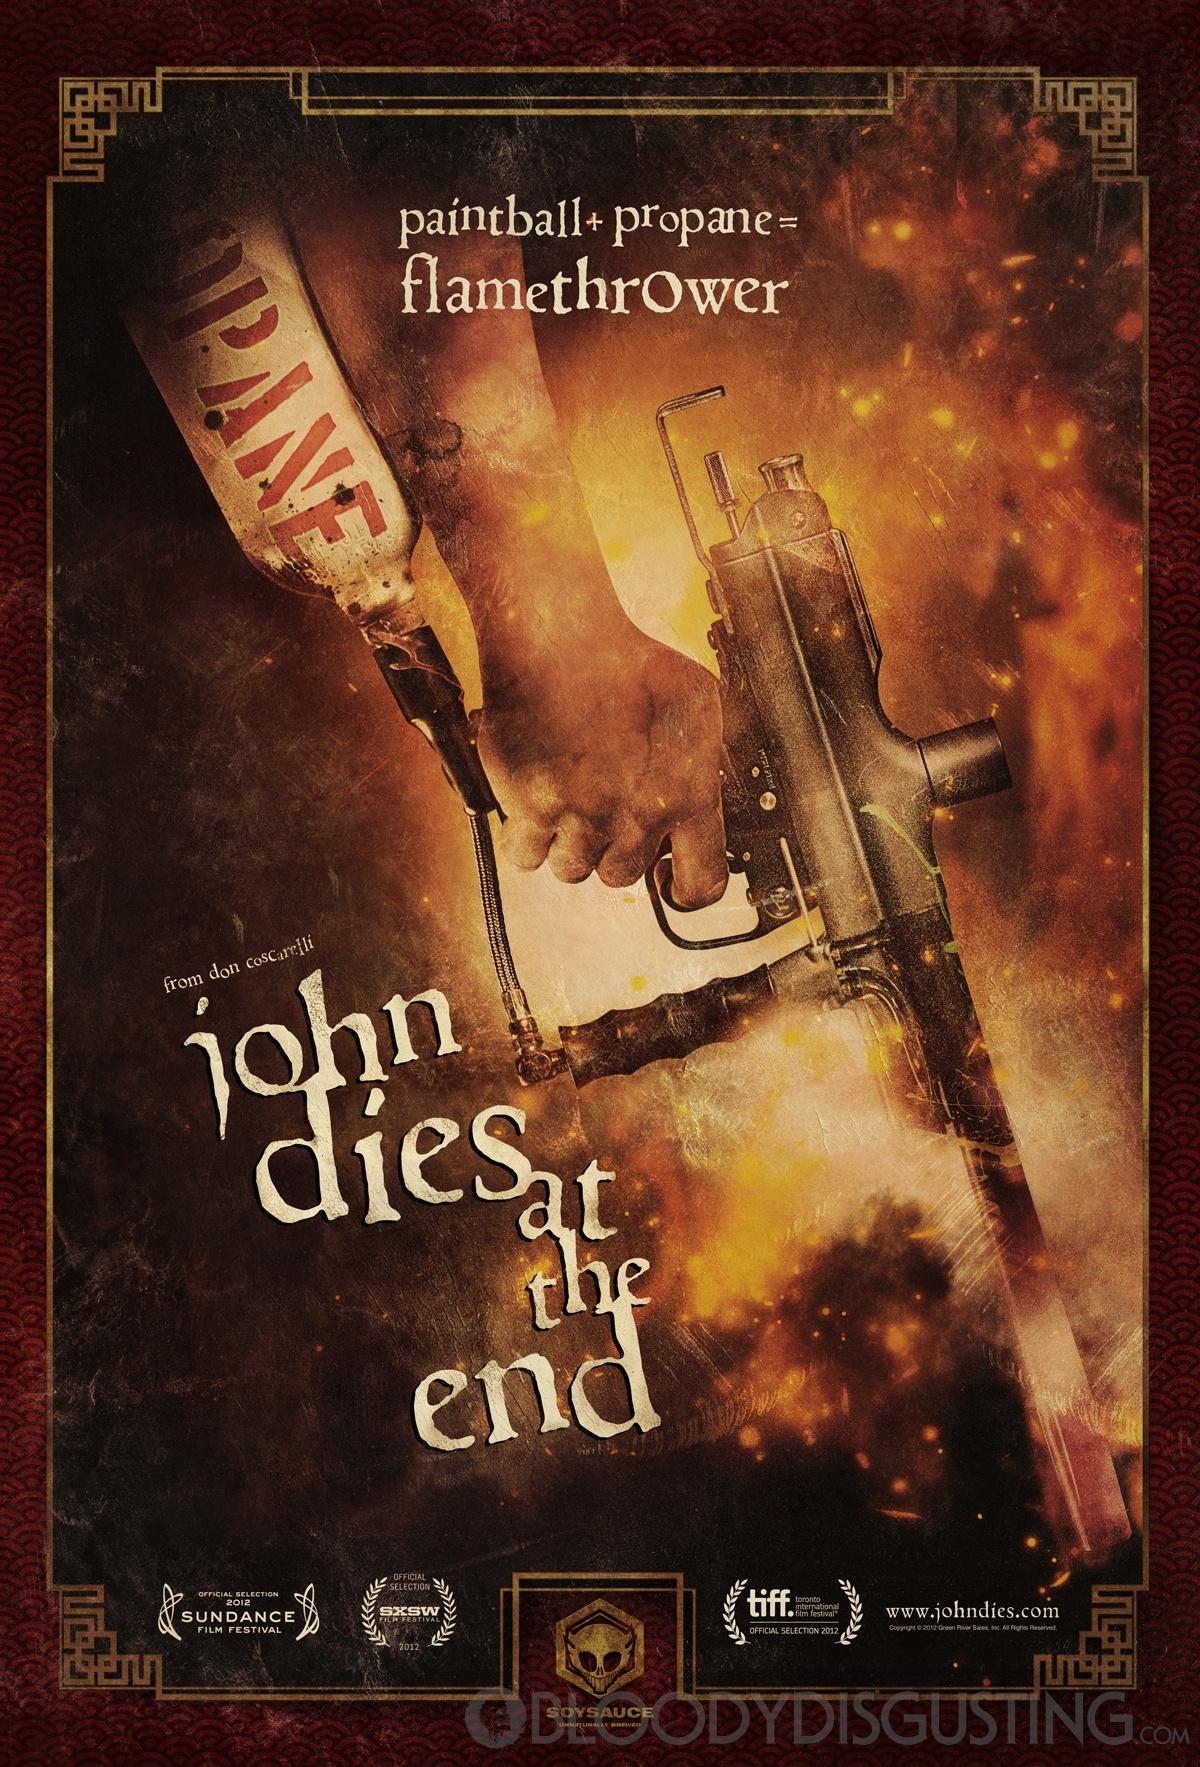 John Dies at the End - Movie Poster #2 (Original)